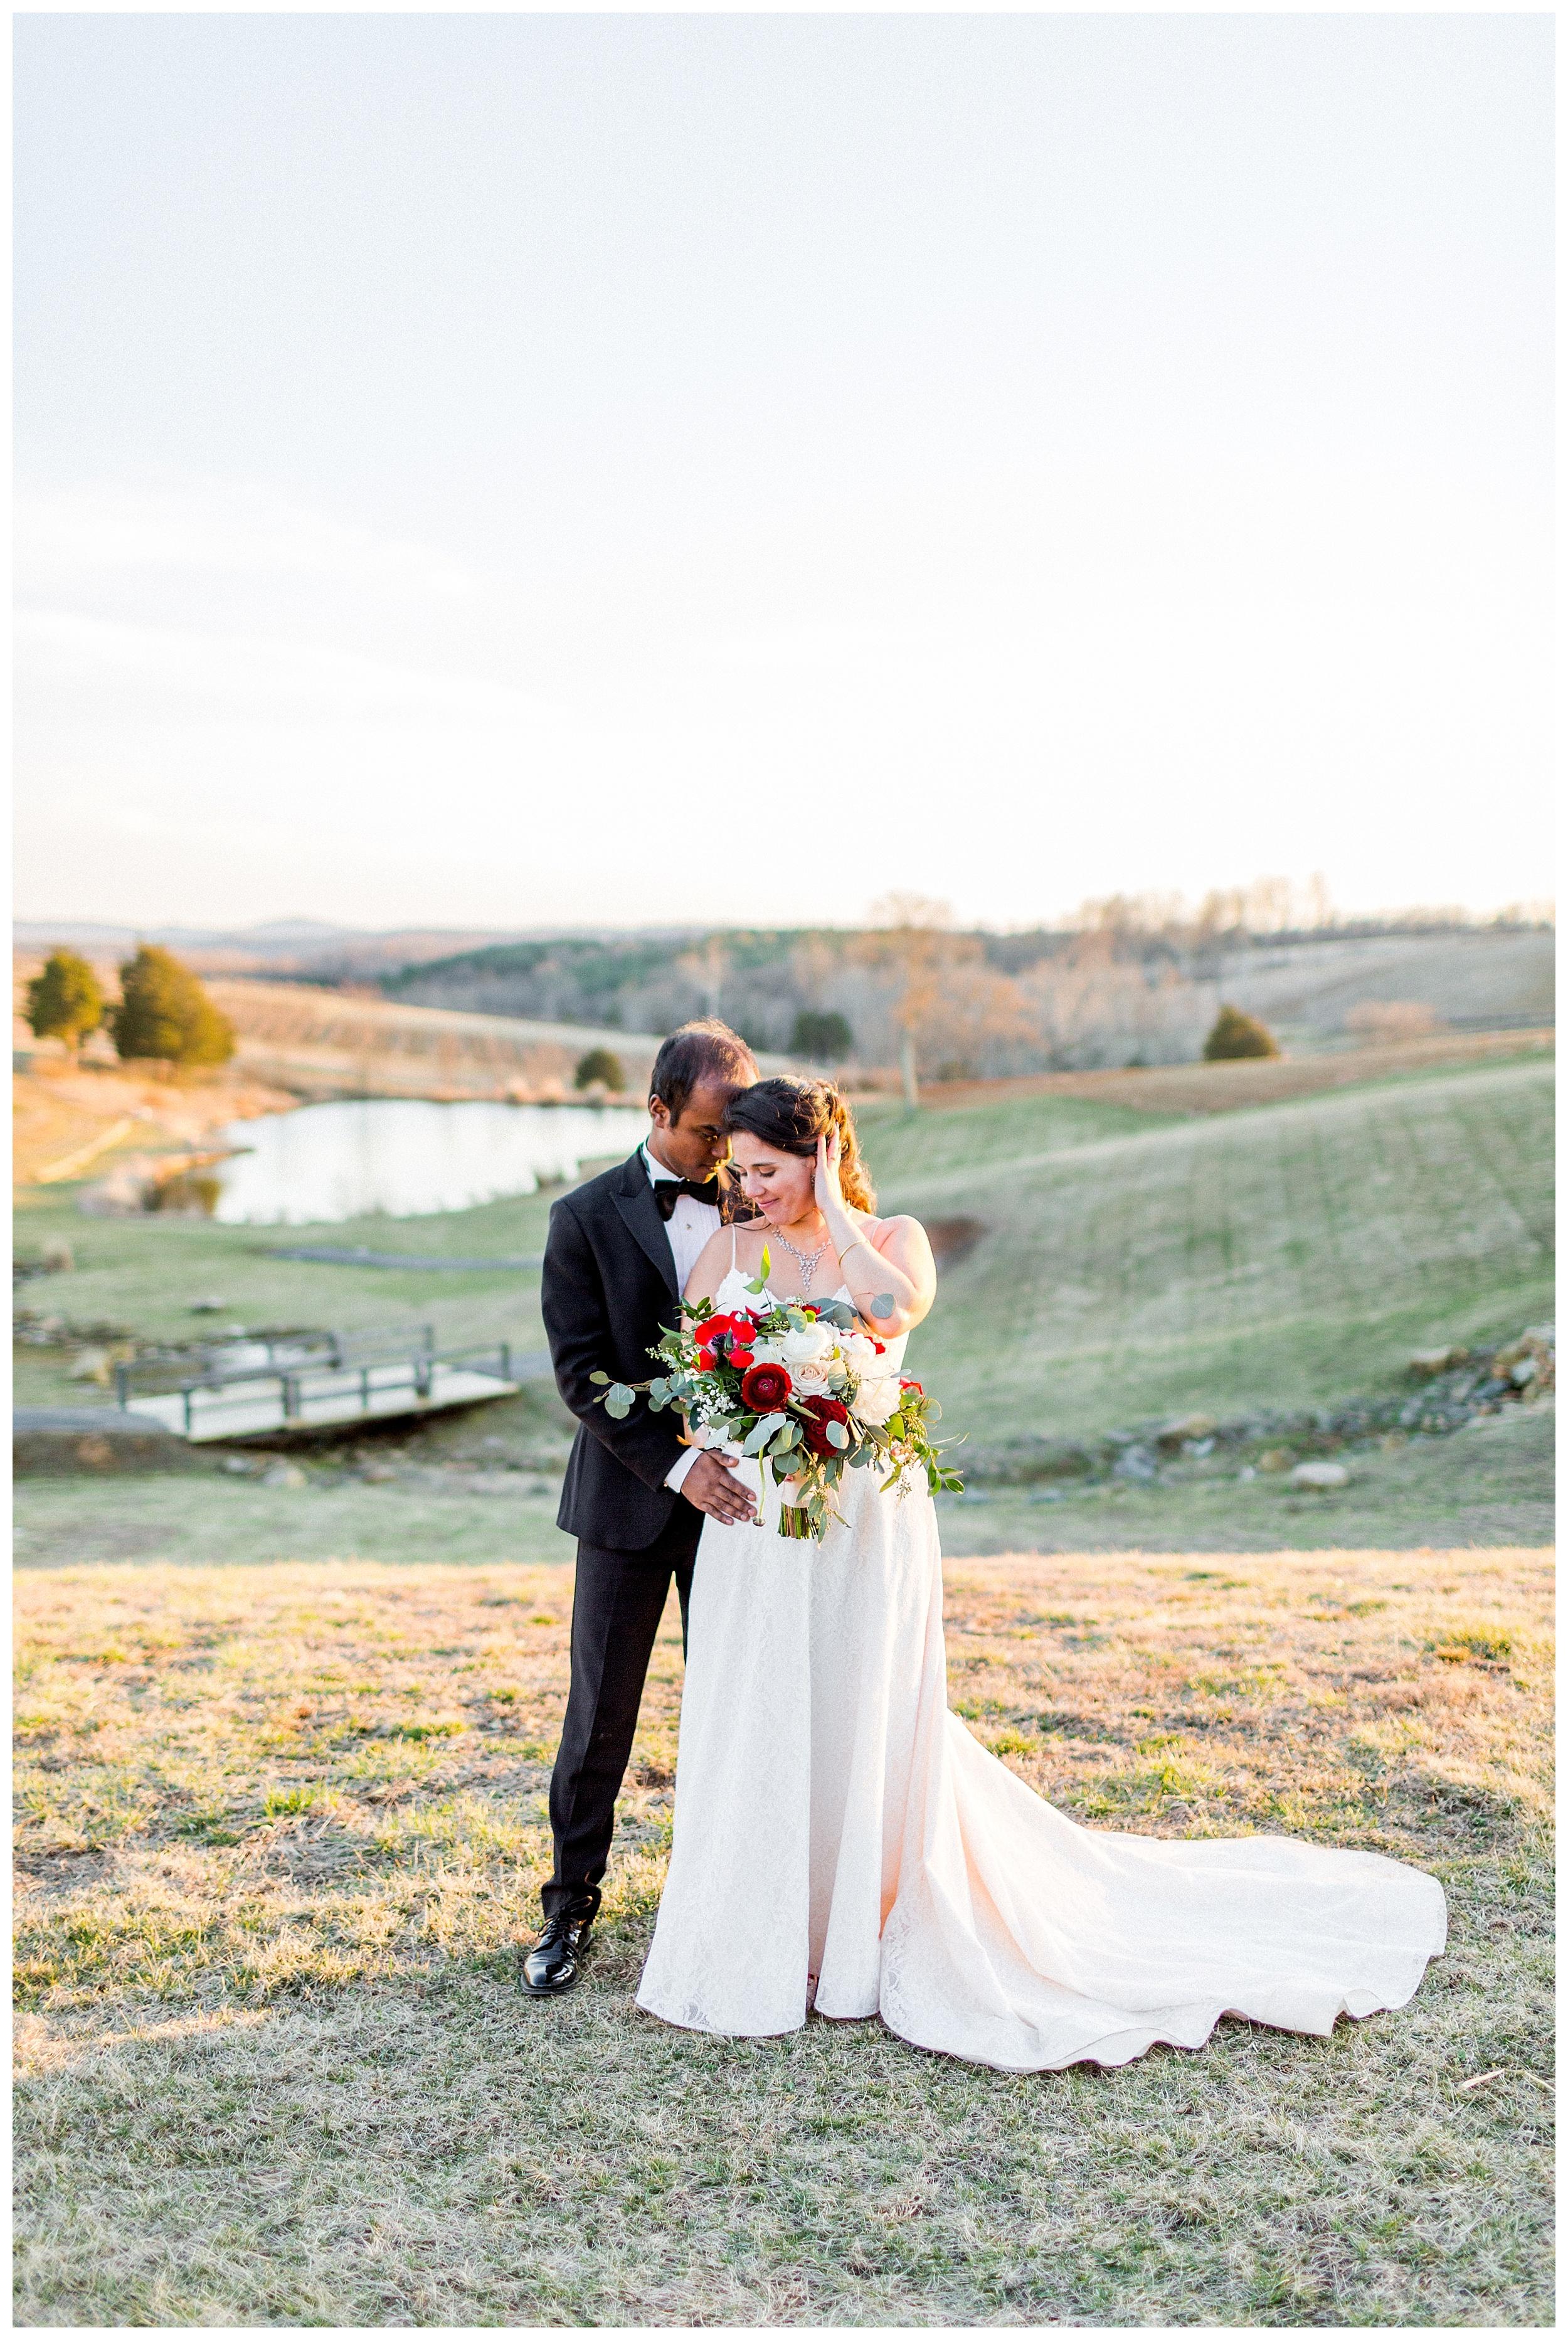 Stone Tower Winery Wedding | Virginia Winter Wedding | VA Wedding Photographer Kir Tuben_0102.jpg